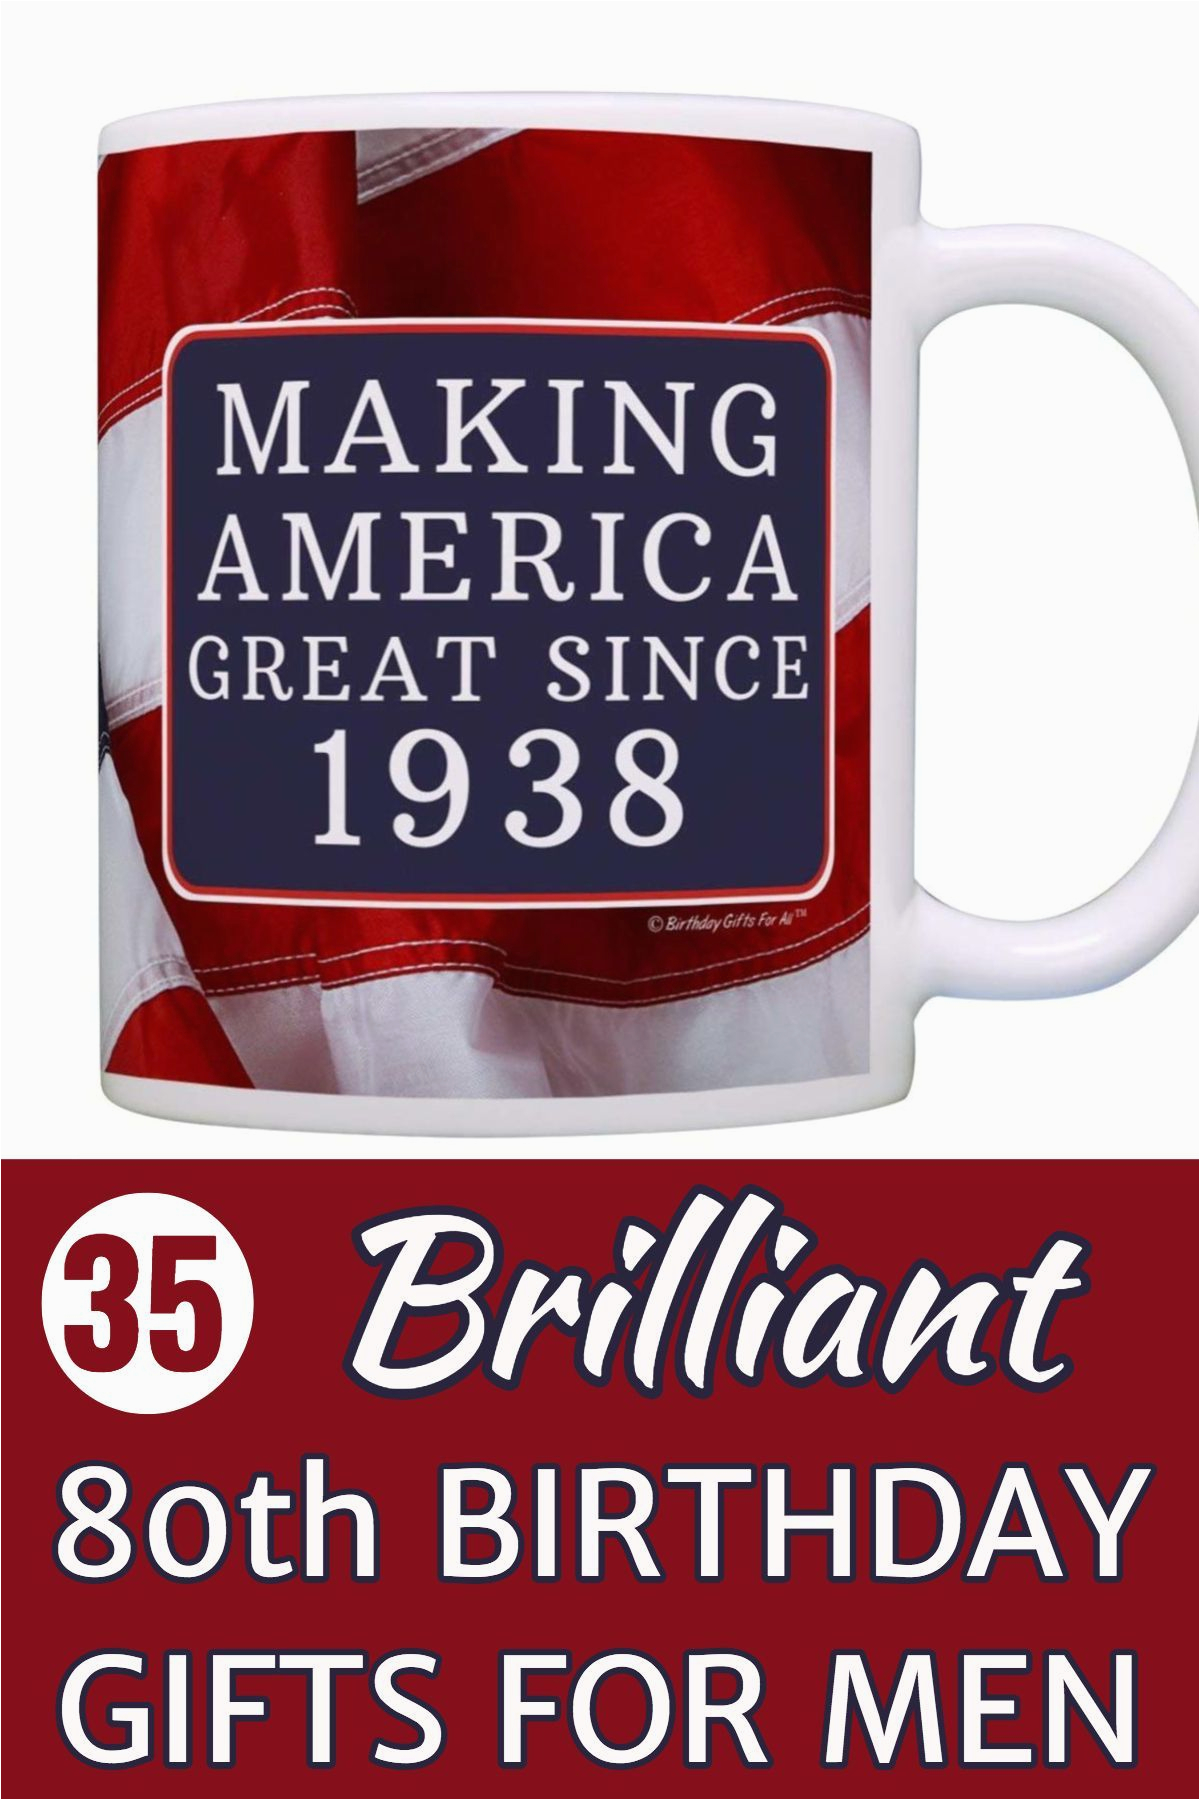 80th birthday gift ideas for men